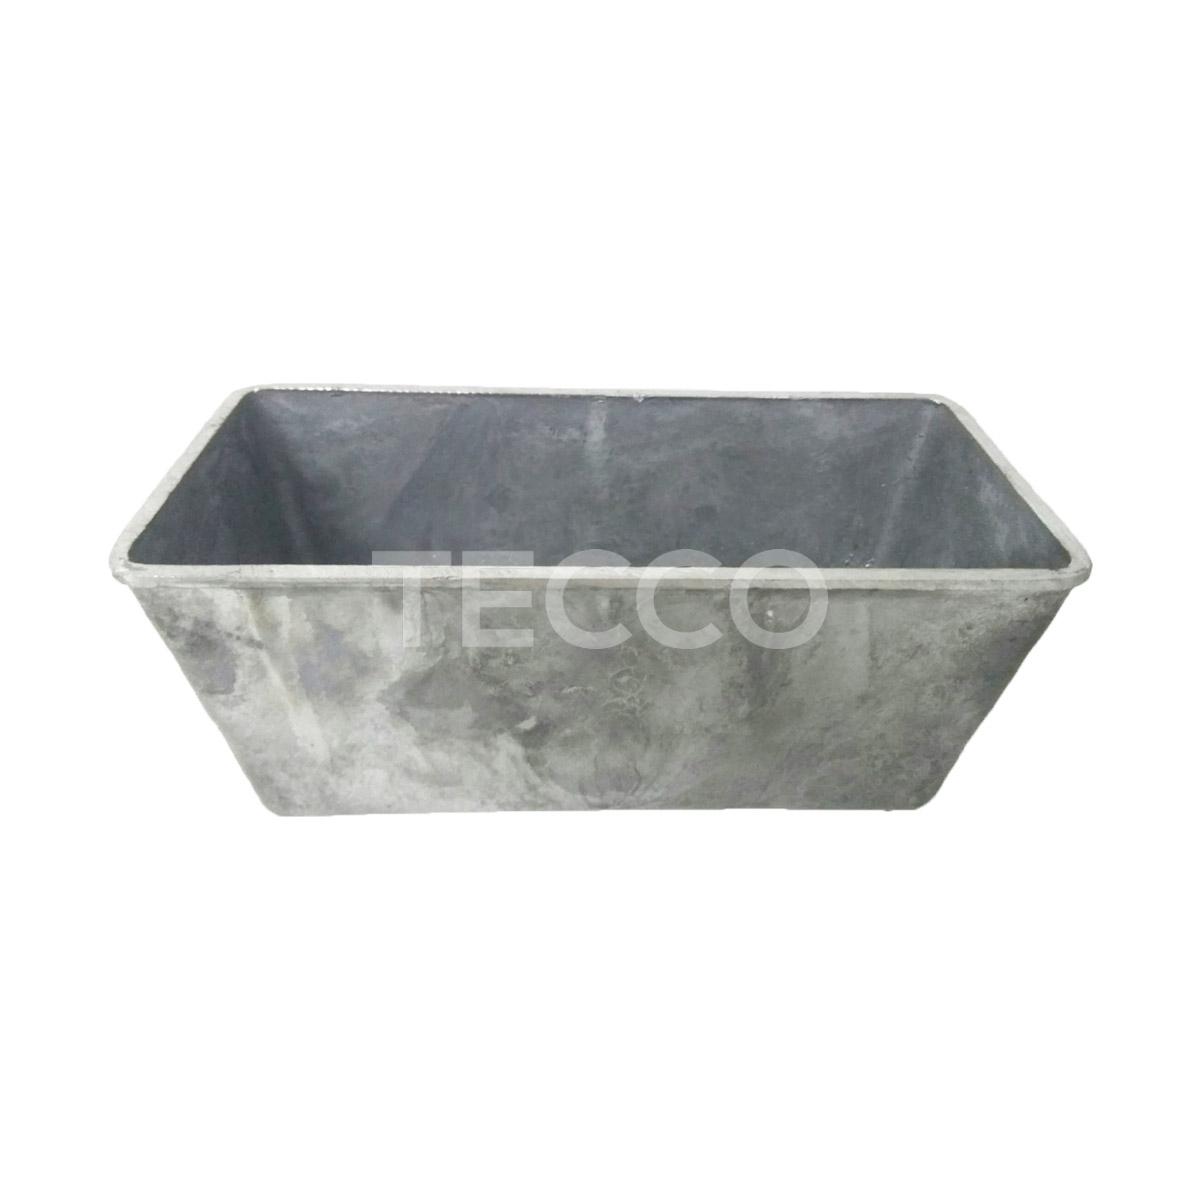 Форма хлебная Tecco №12 167x76x73